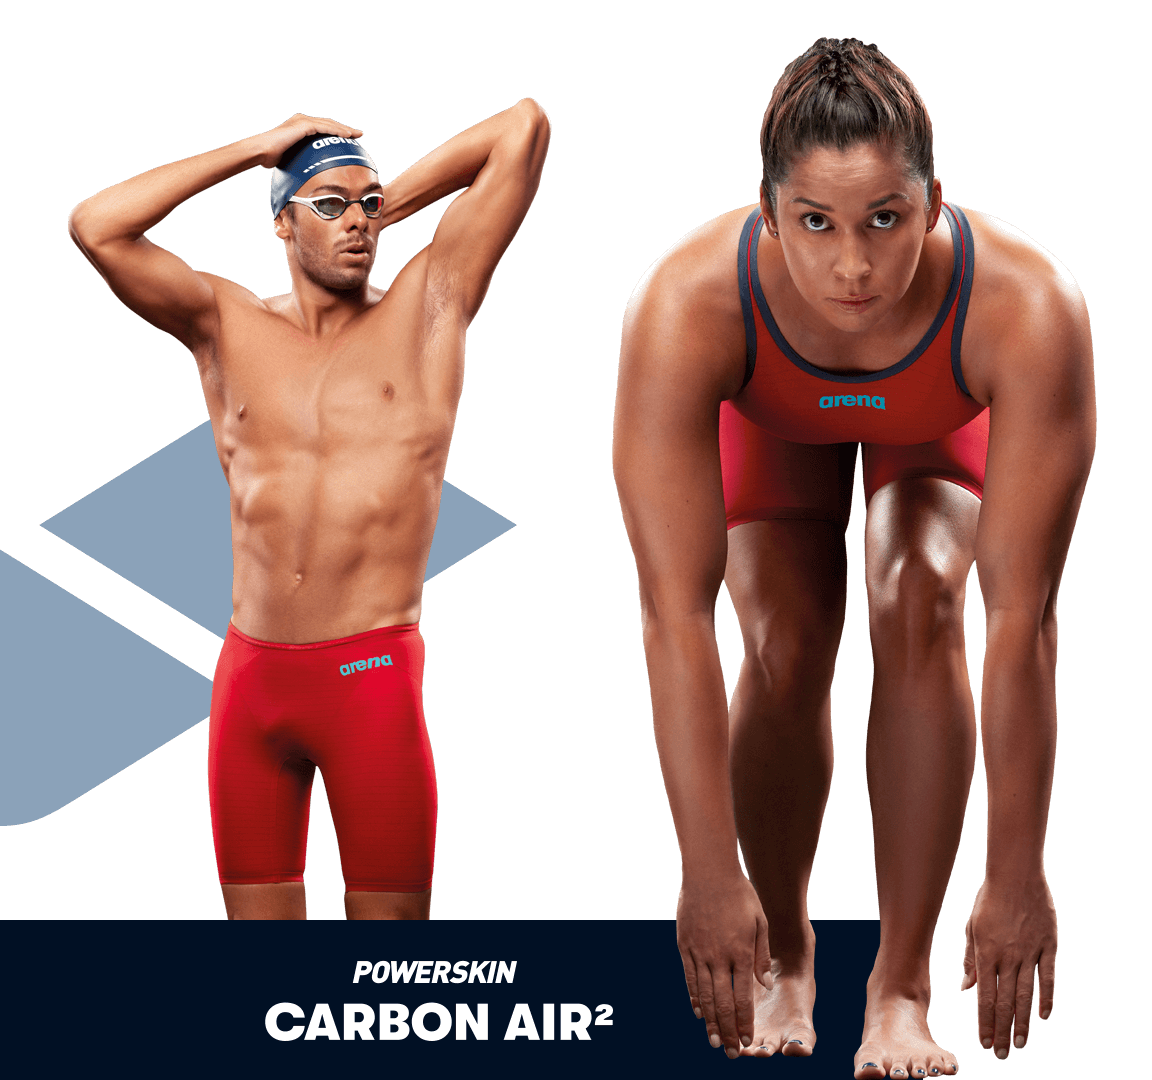 arena Powerskin Carbon Air 2 race suit